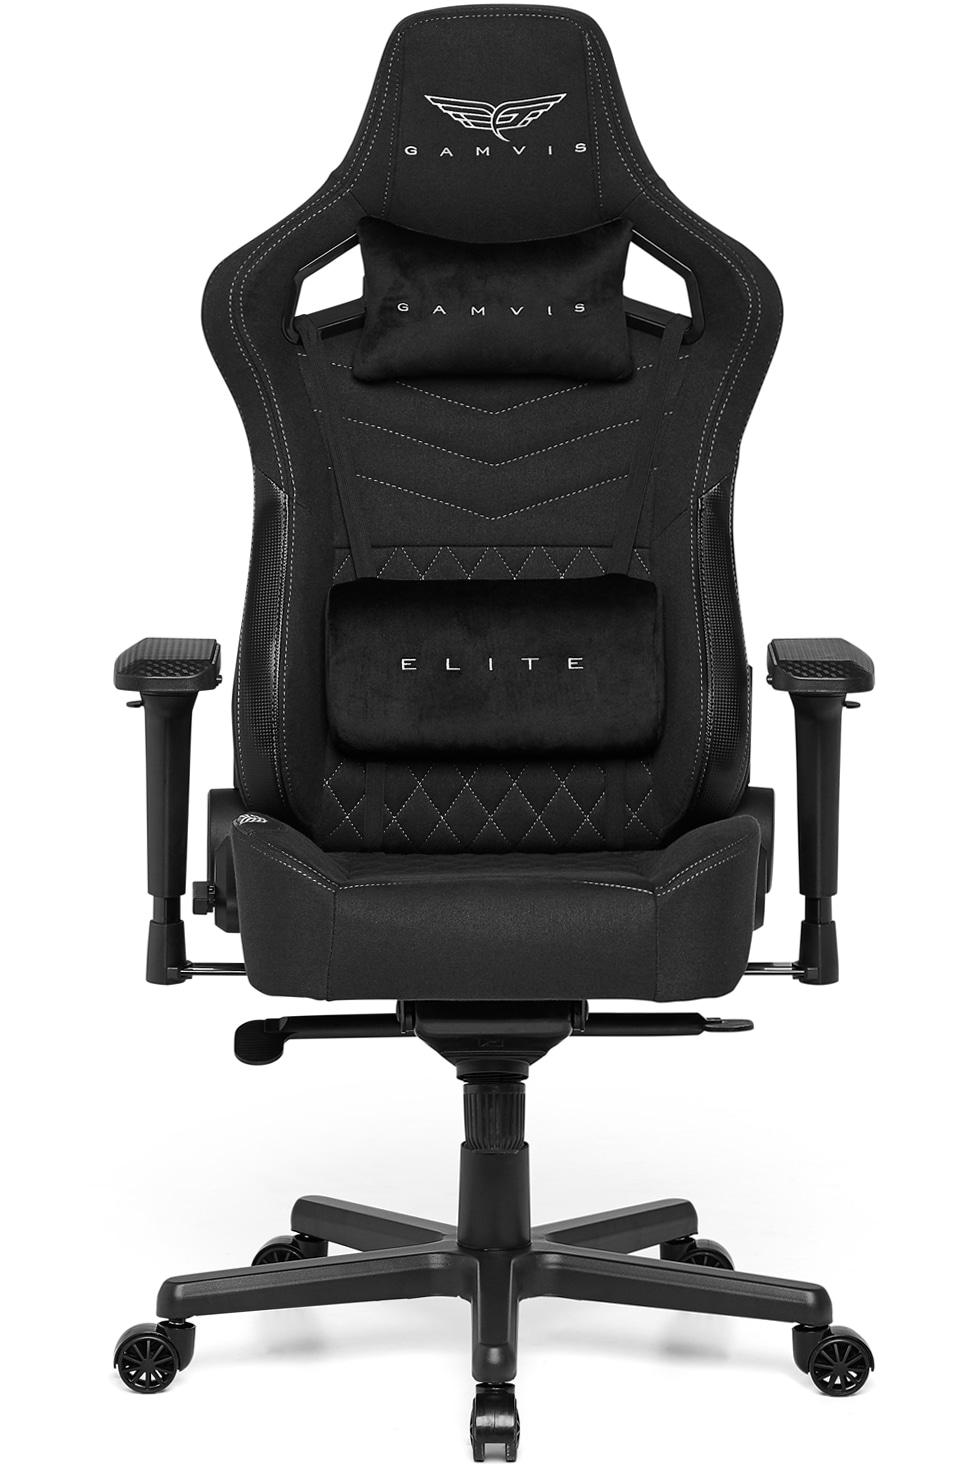 Gamvis ELITE 2.0 XL Fabric Gaming Chair – Black/Diamond White